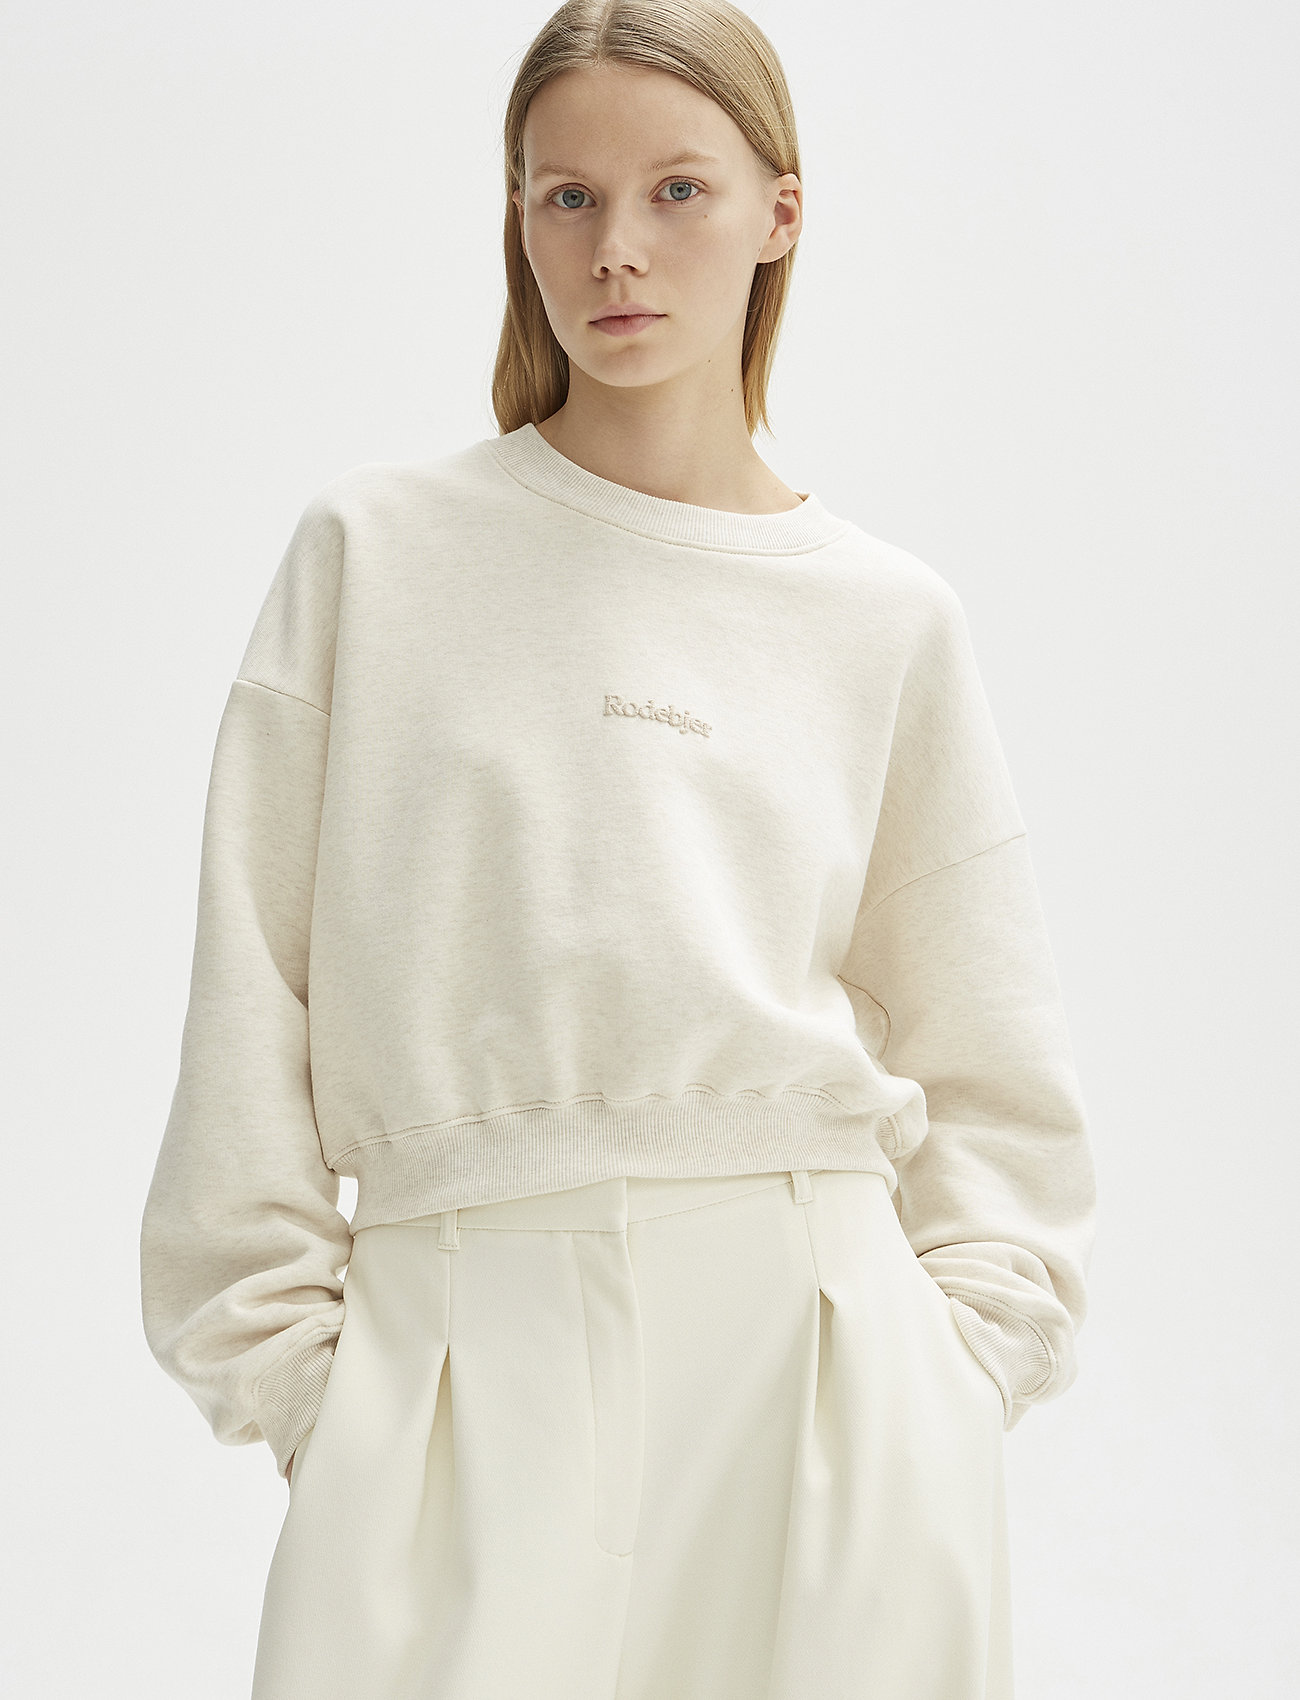 RODEBJER - RODEBJER KOLOMAN - sweatshirts & hættetrøjer - puffy white - 0